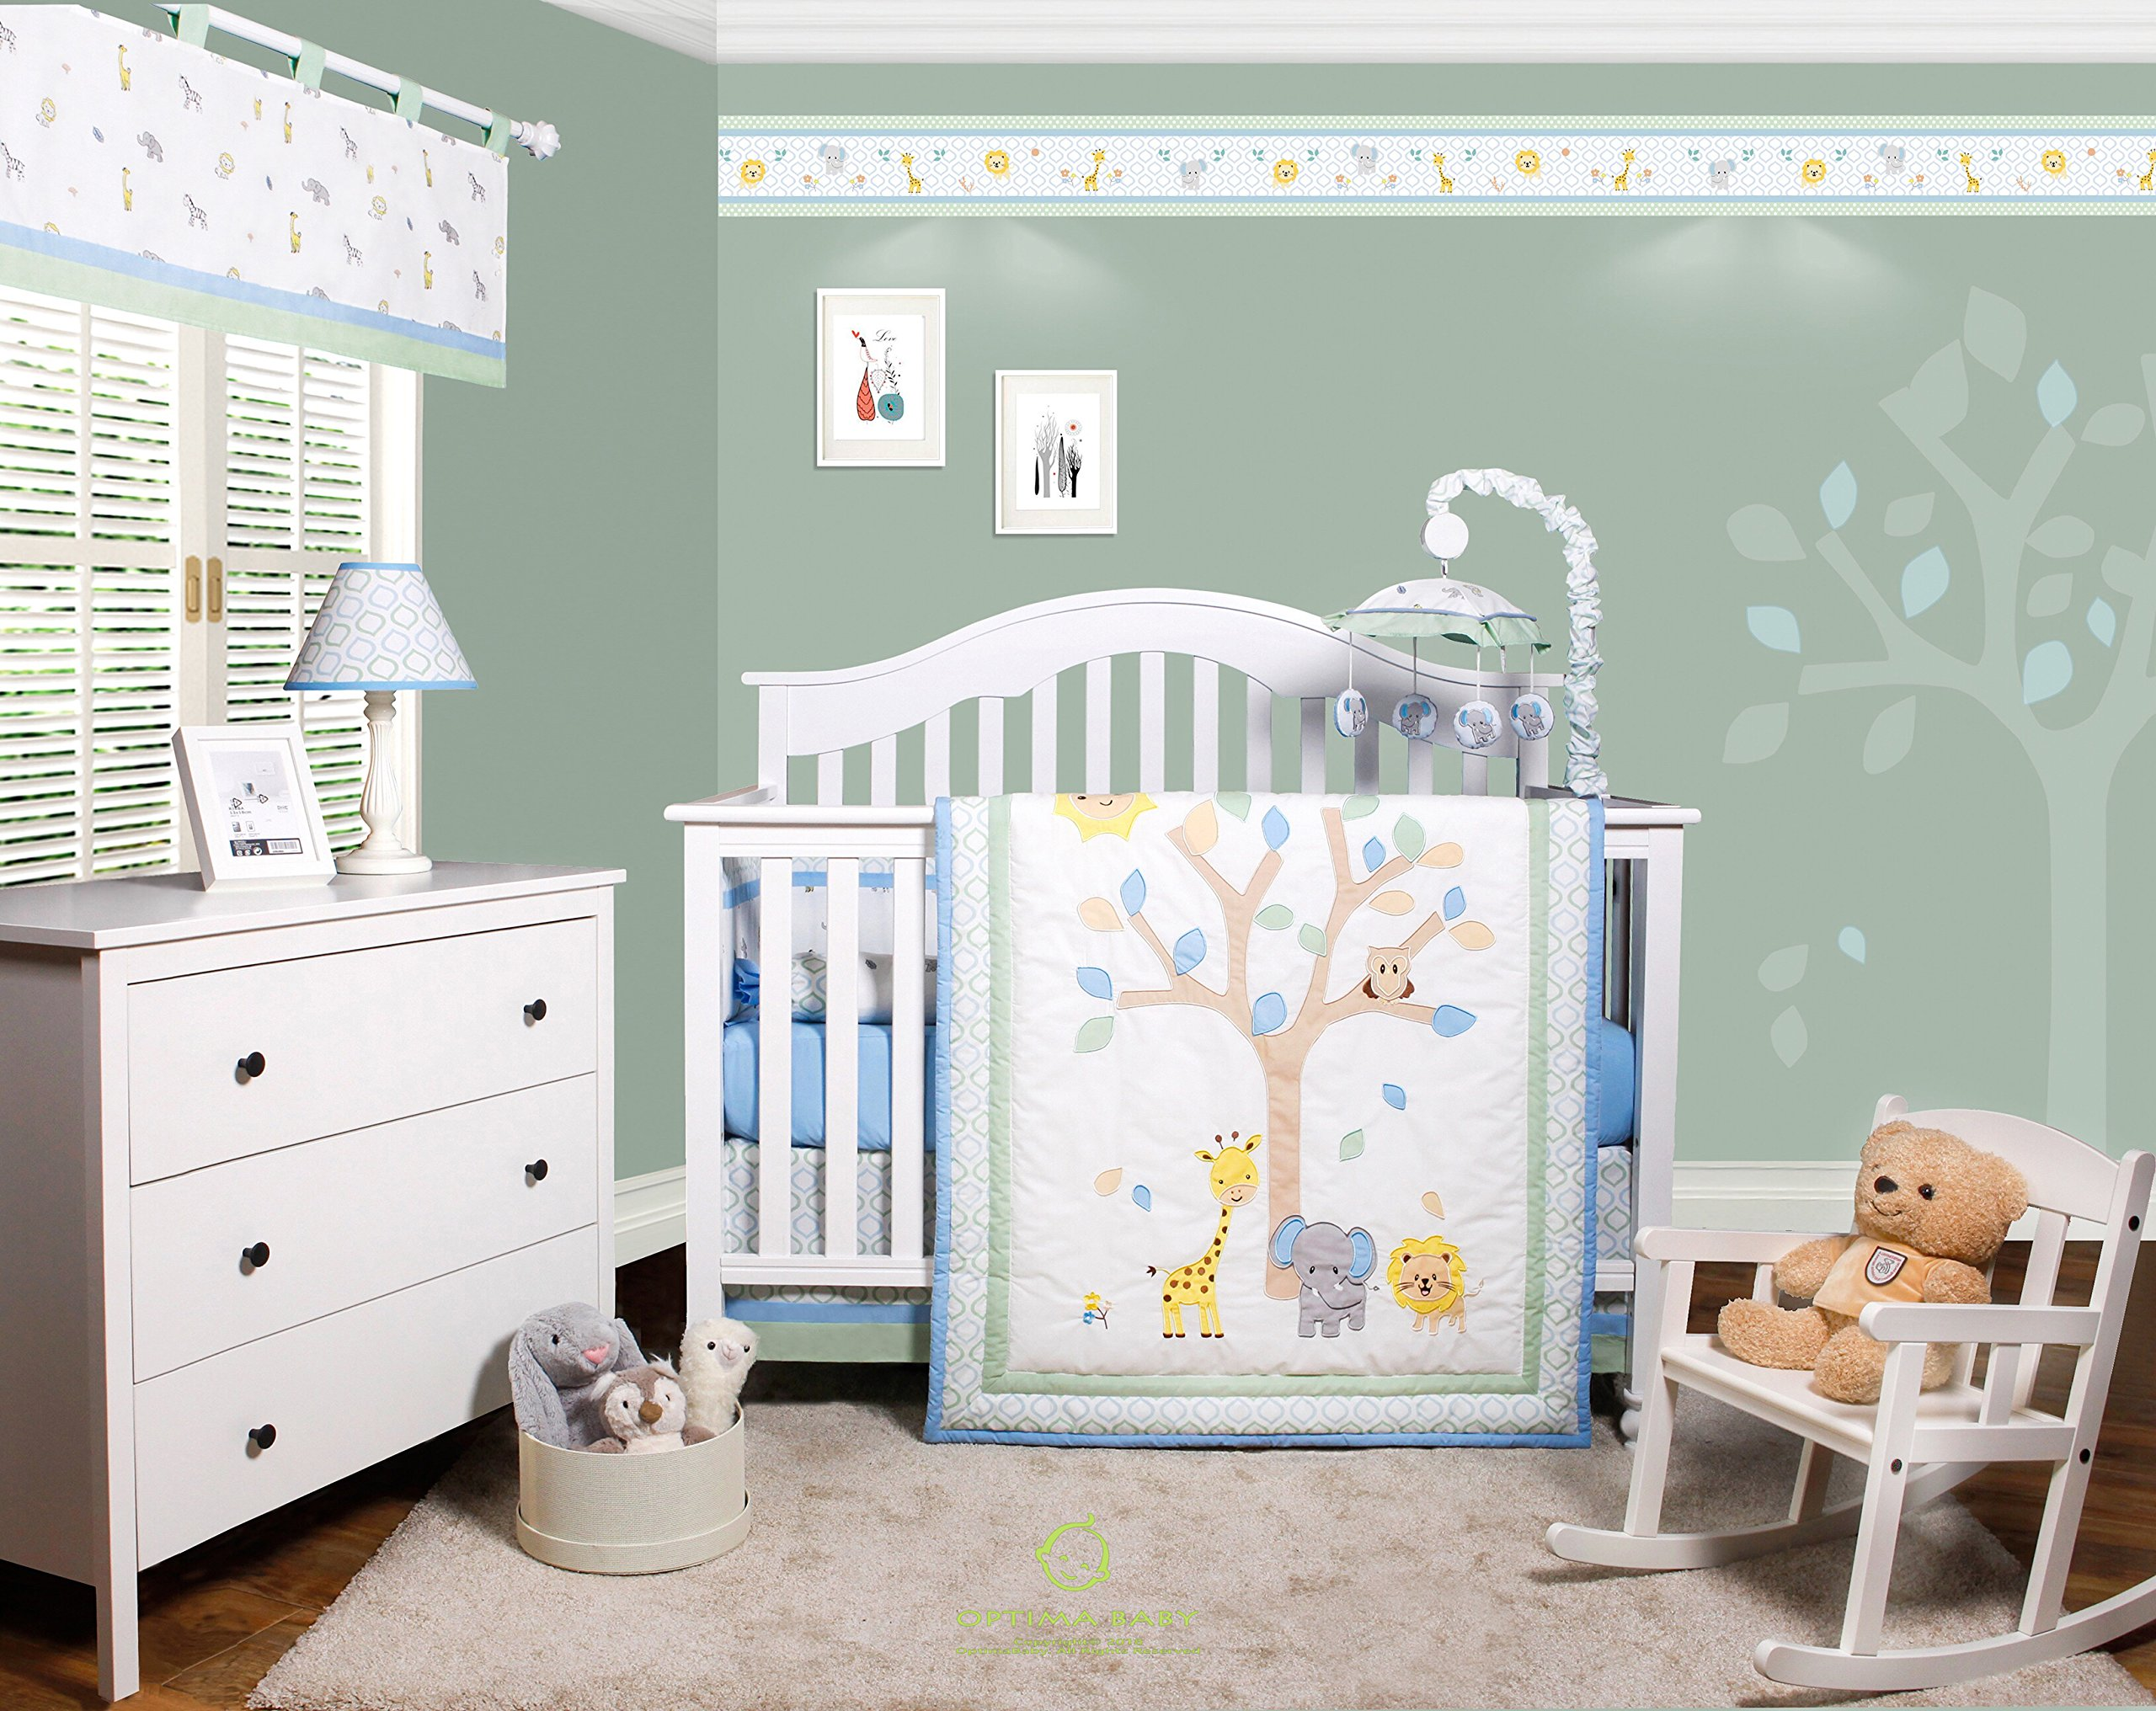 GEENNY OptimaBaby Safari Jungle Animals 6 Piece Baby Nursery Crib Bedding Set